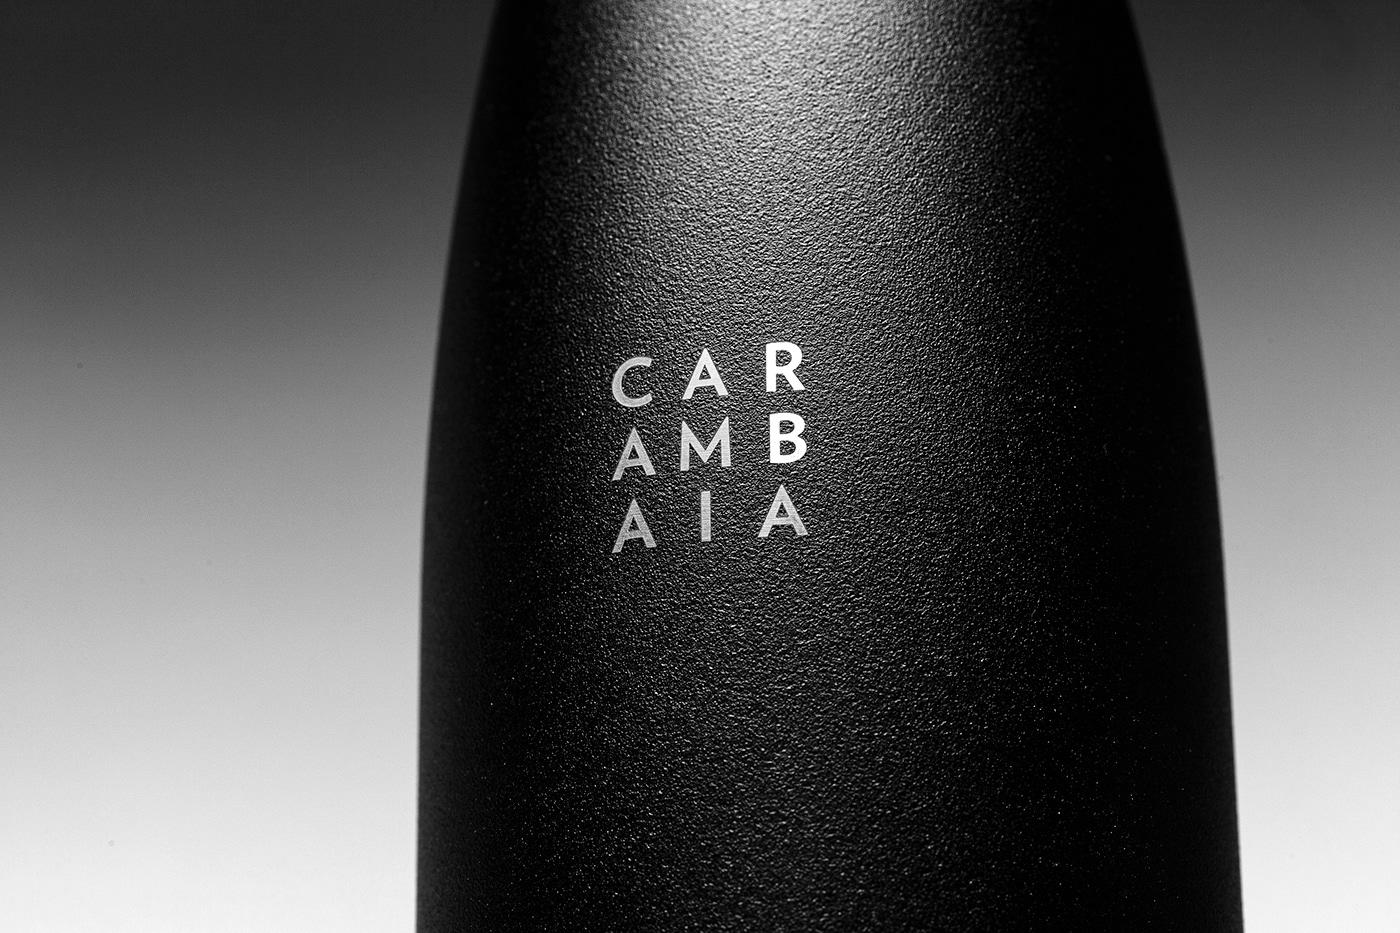 Logotype on bottle